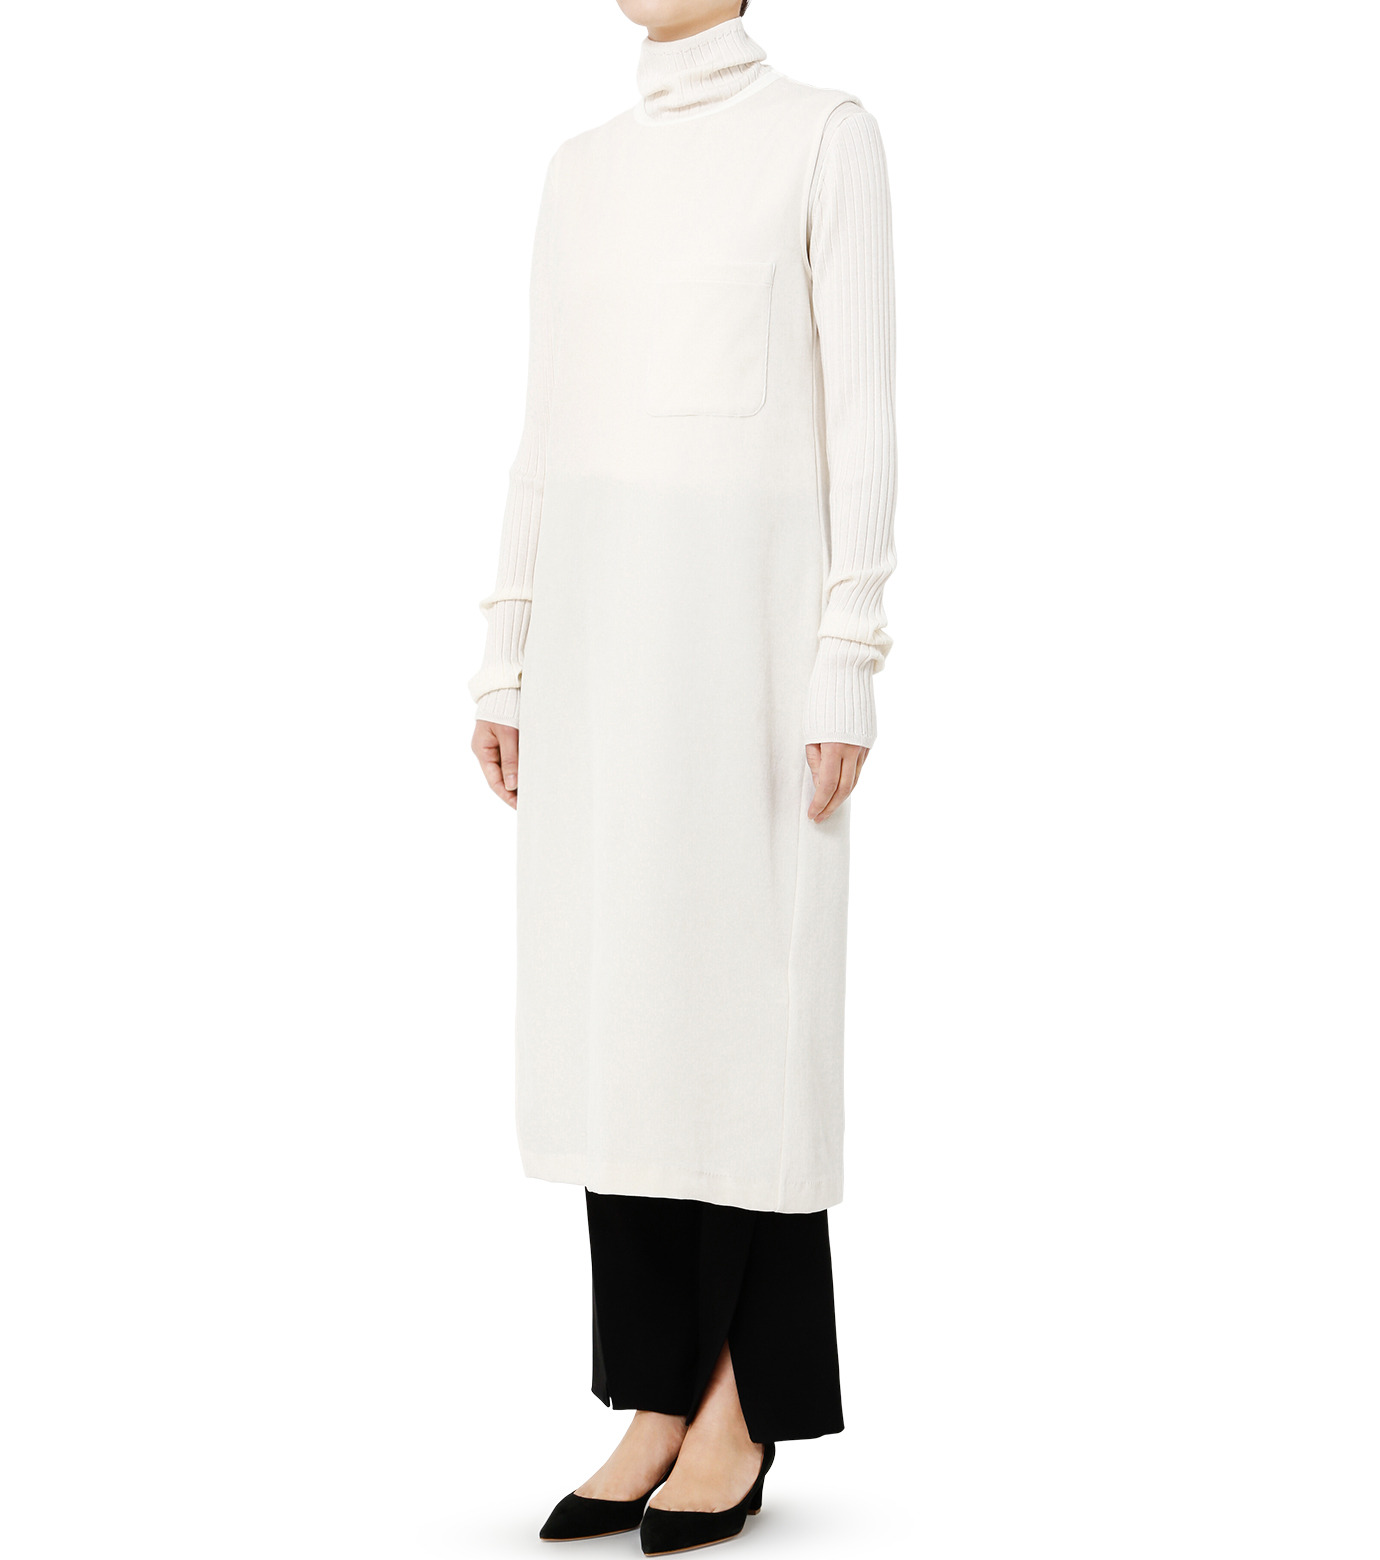 LE CIEL BLEU(ルシェルブルー)のベロアチュニックドレス-WHITE(トップス/tops)-19S62102 拡大詳細画像3